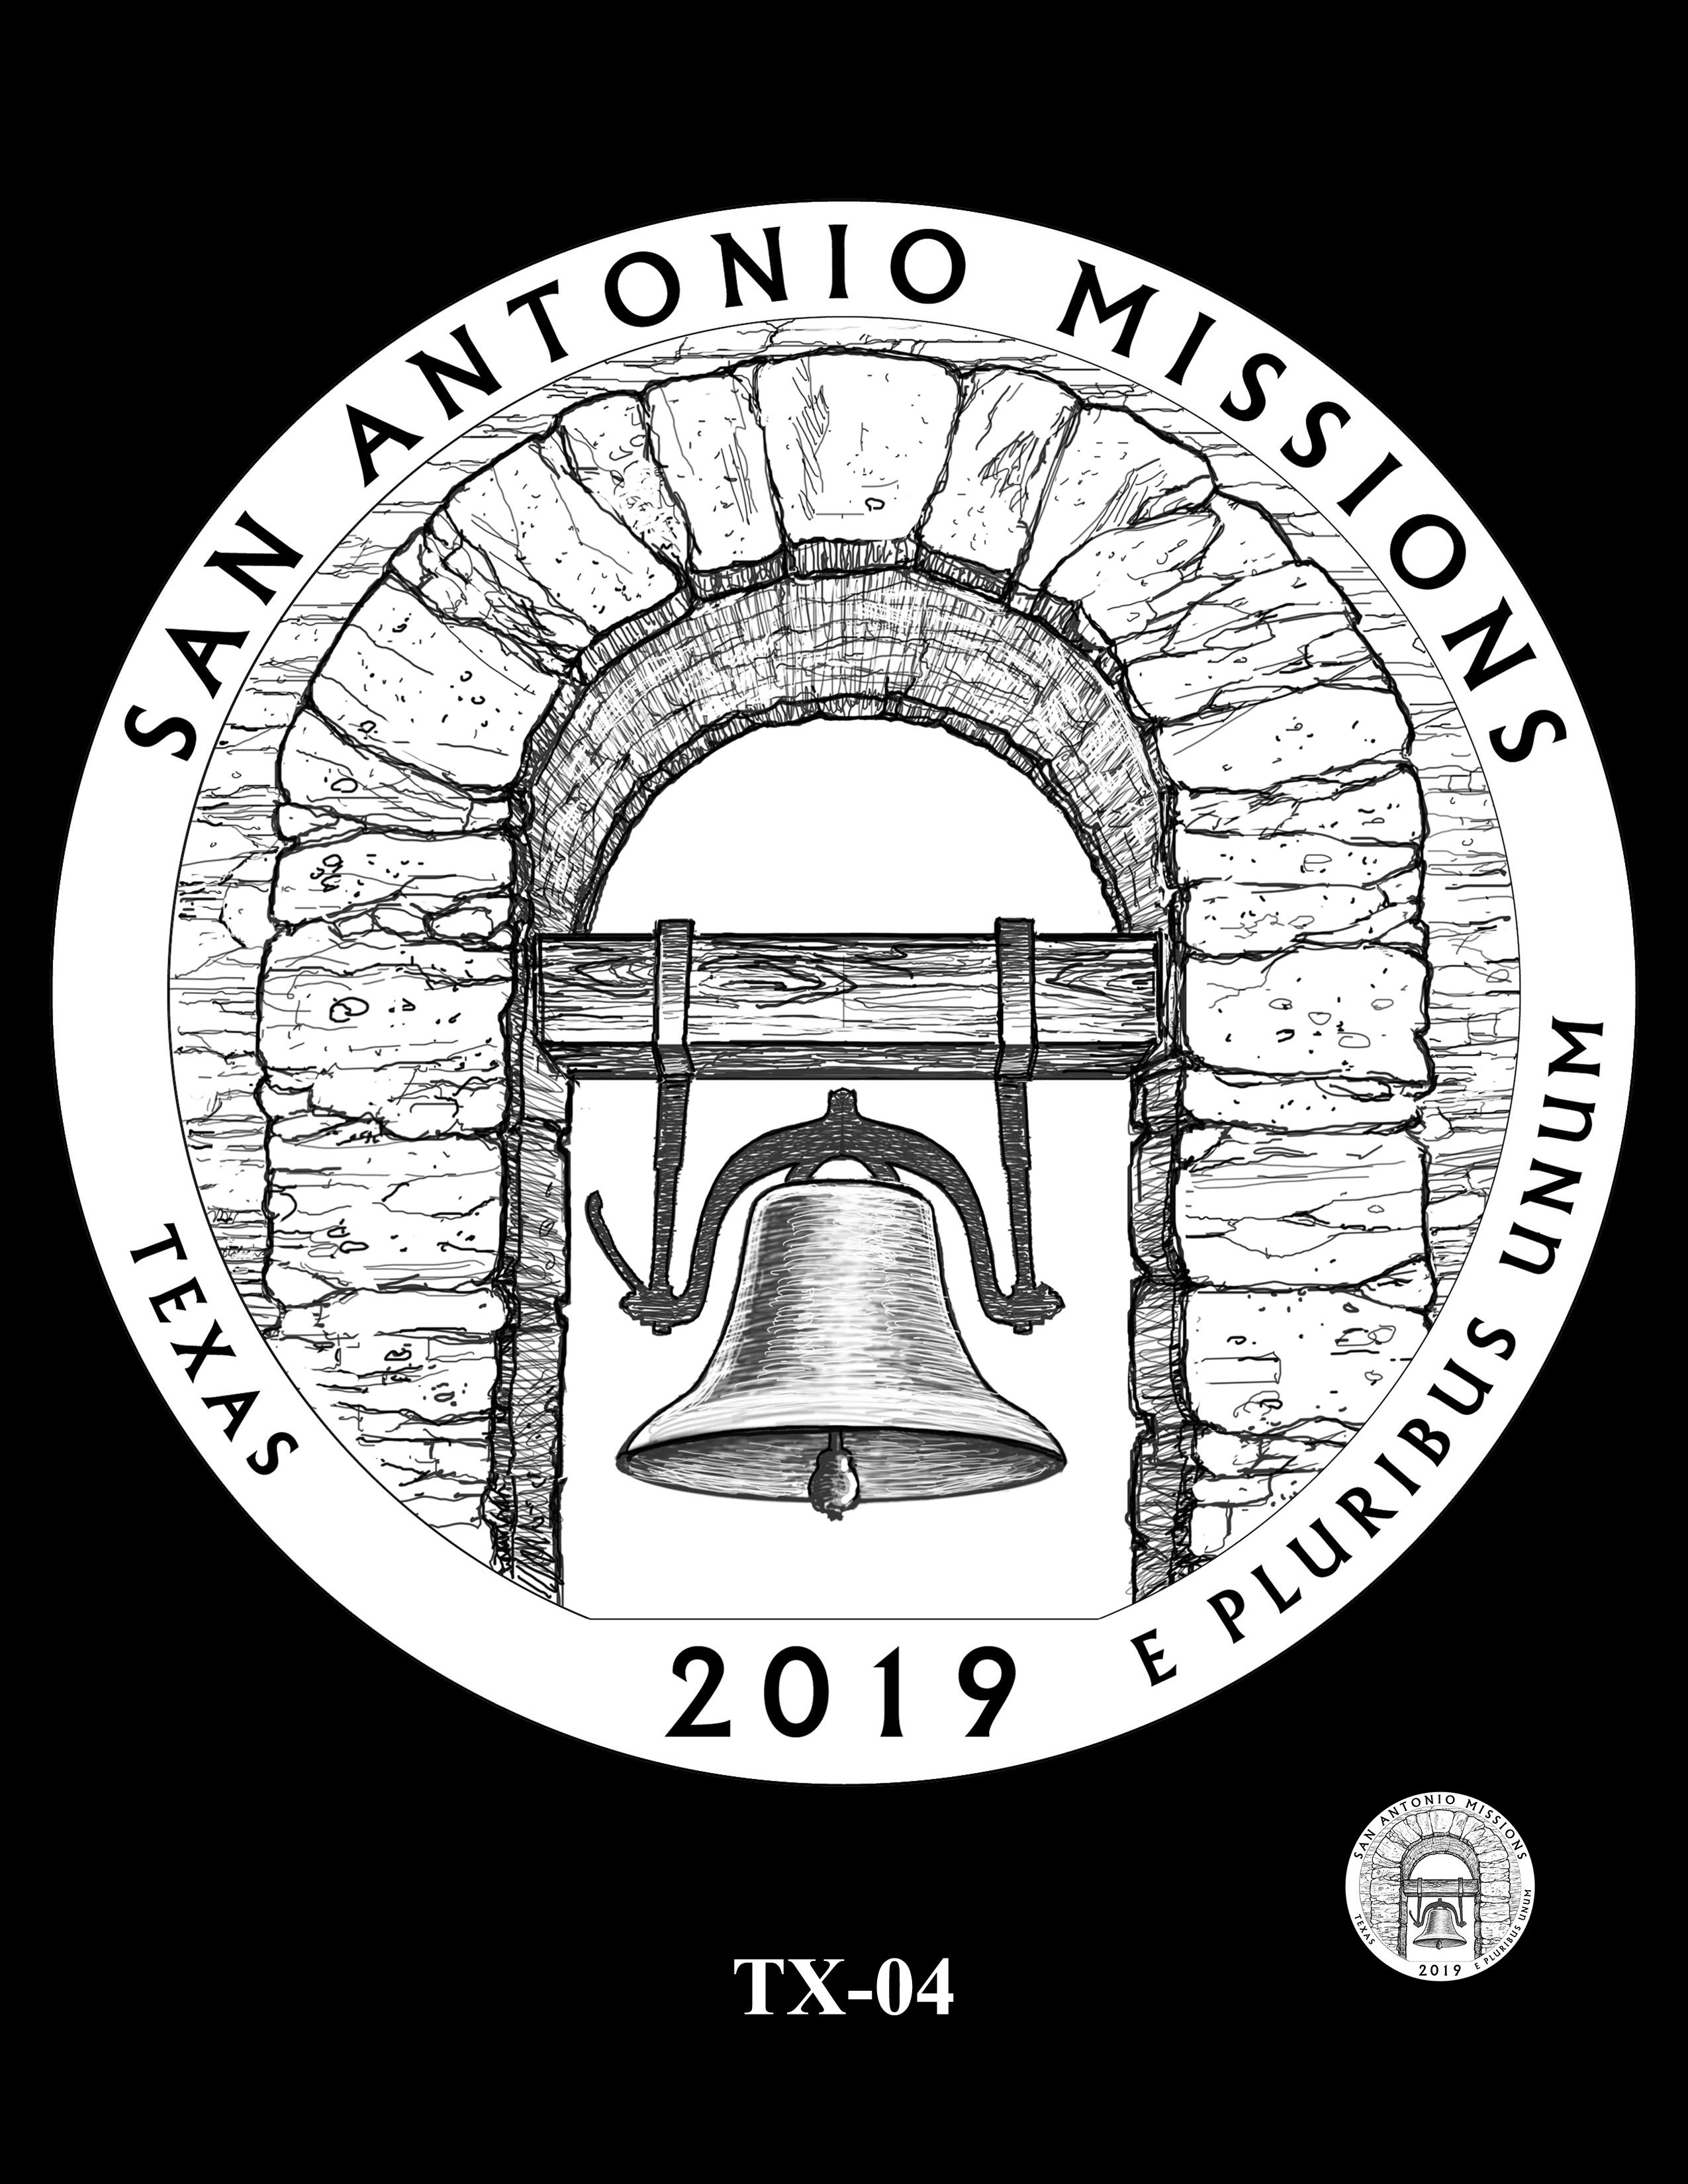 TX-04 -- 2019 America the Beautiful Quarters® Program